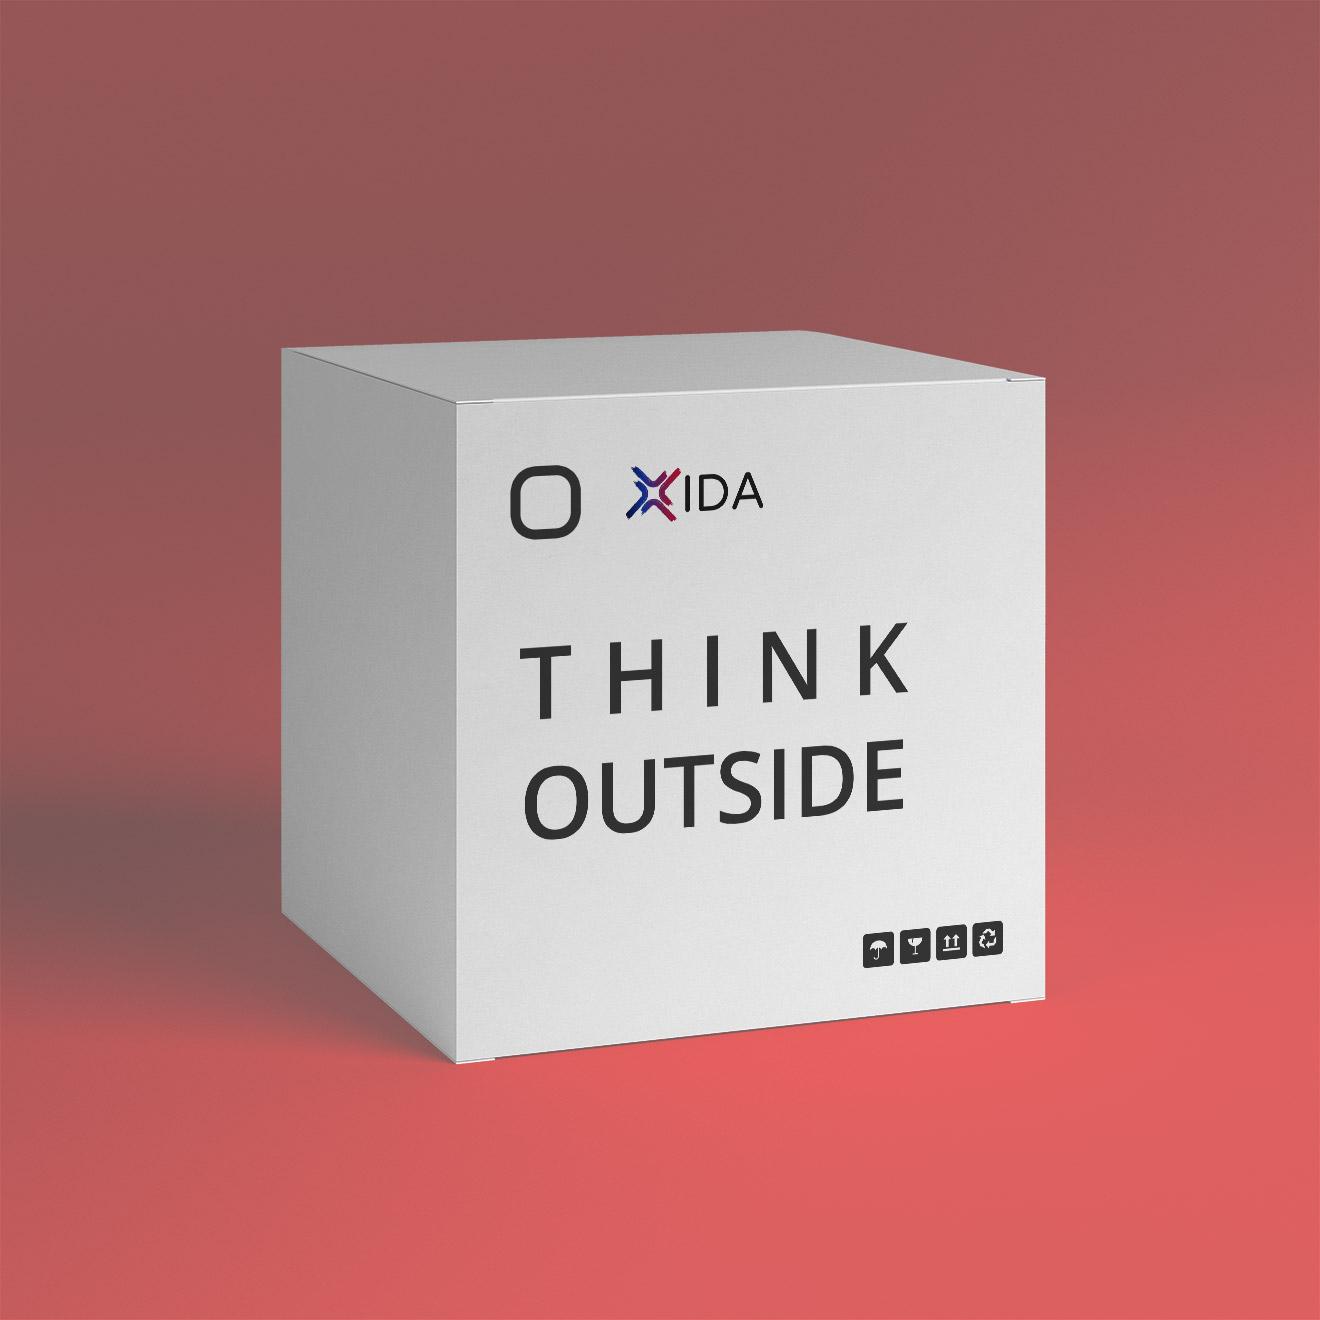 IDA thinks outside the box.